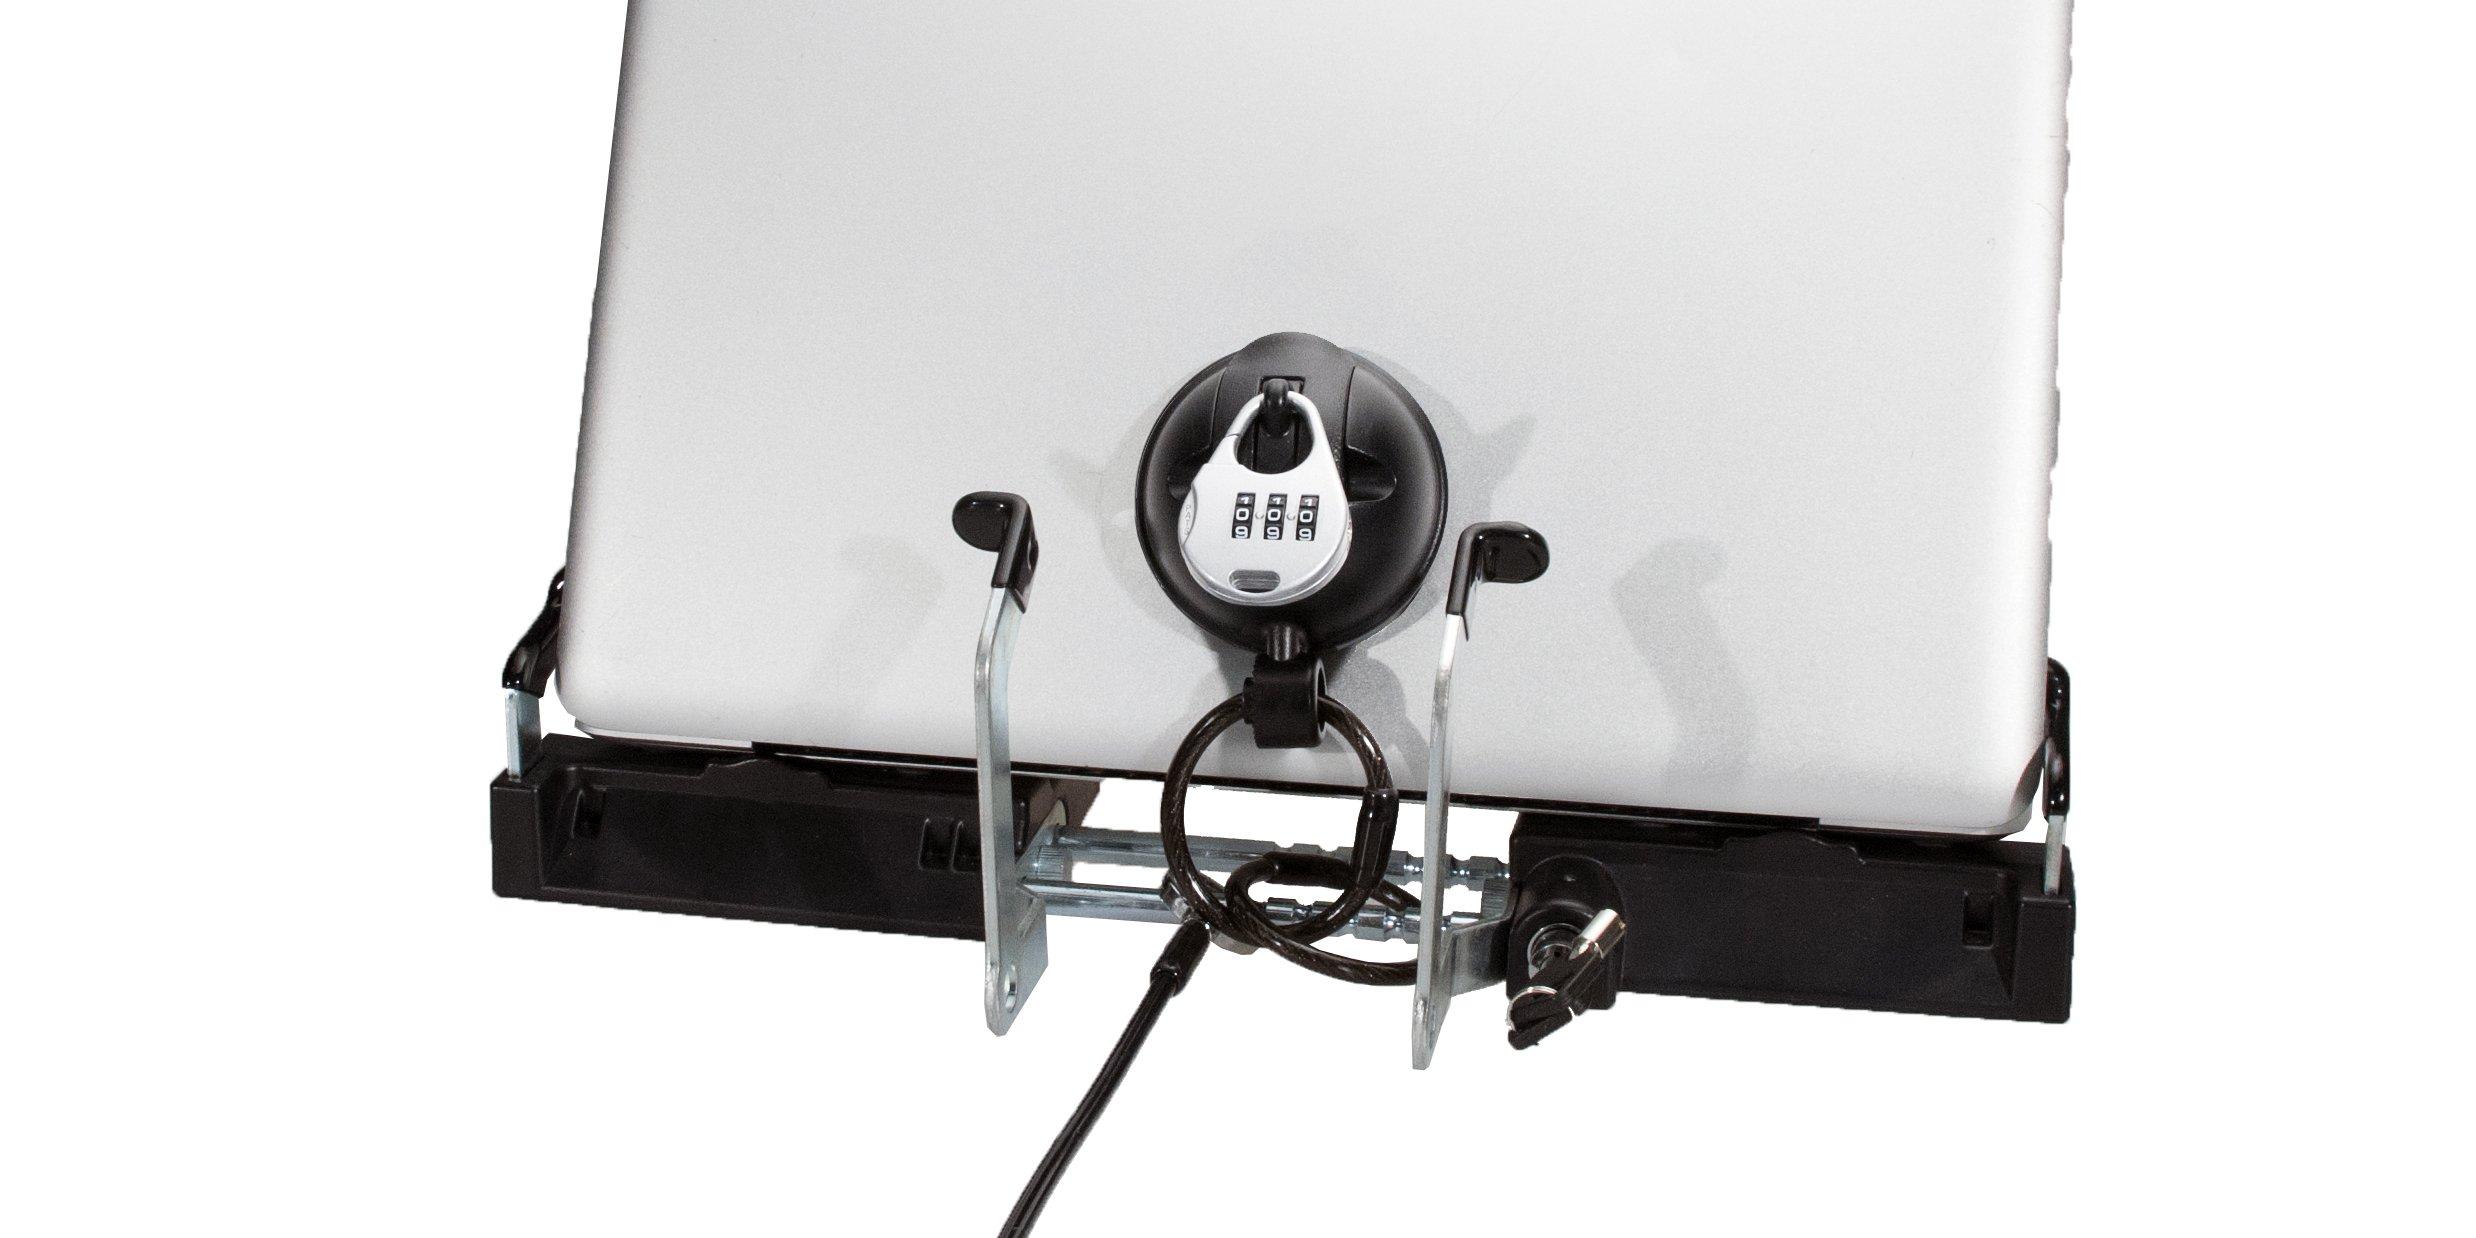 CTA Digital Heavy Duty Tri-Security Station for Tablet-Laptop Hybrids - PAD-SSLT by CTA Digital (Image #4)